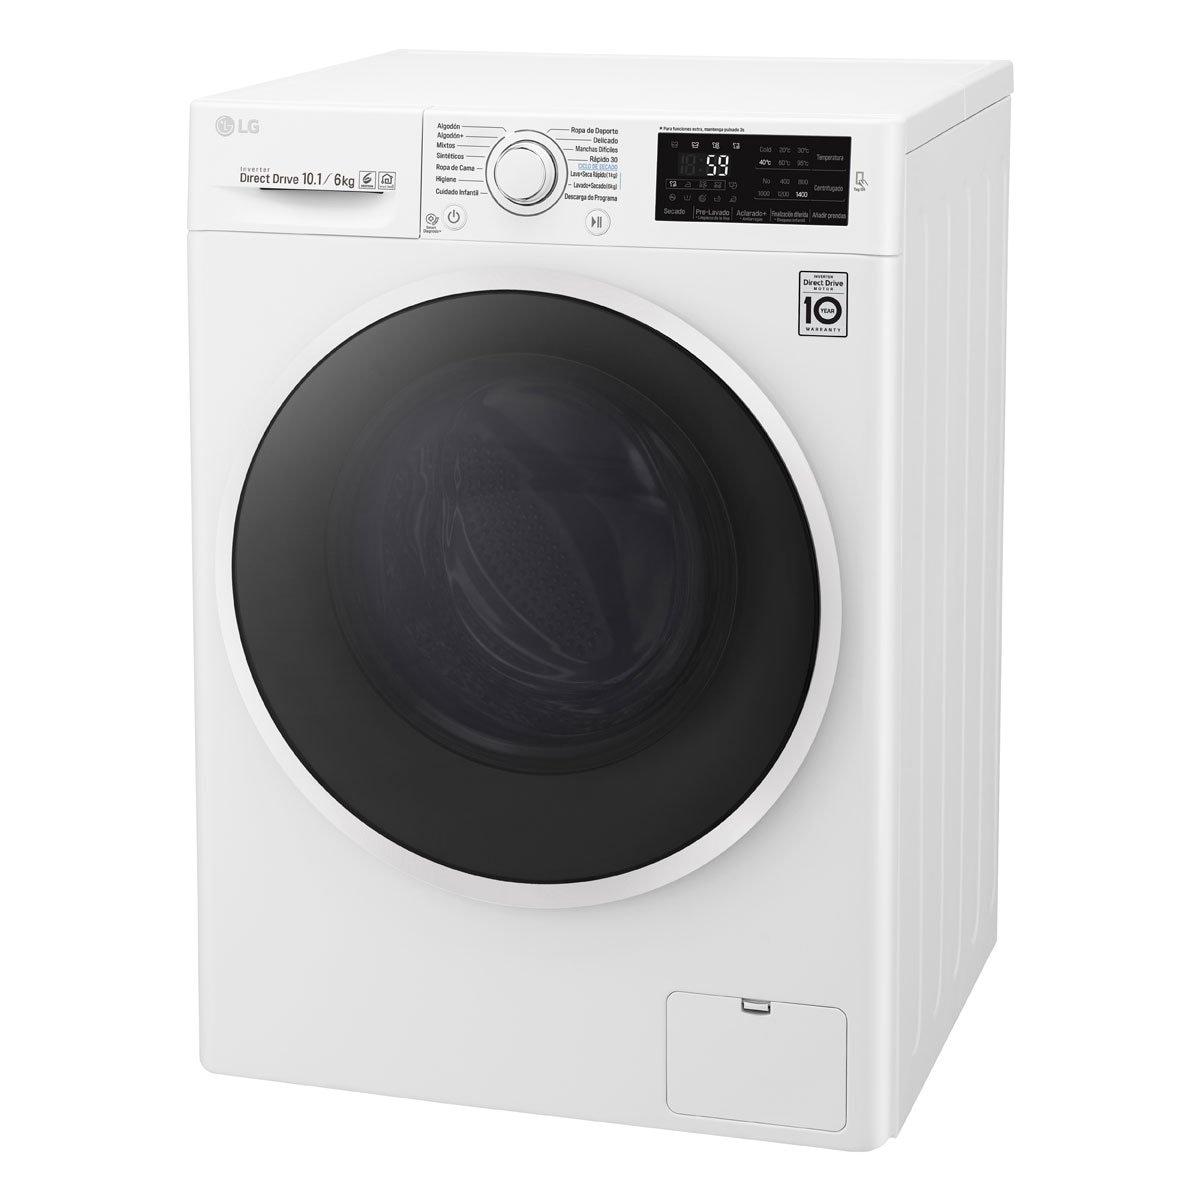 Lavasecadora Frontal 10.1/6 Kg Wd10Wb Lg